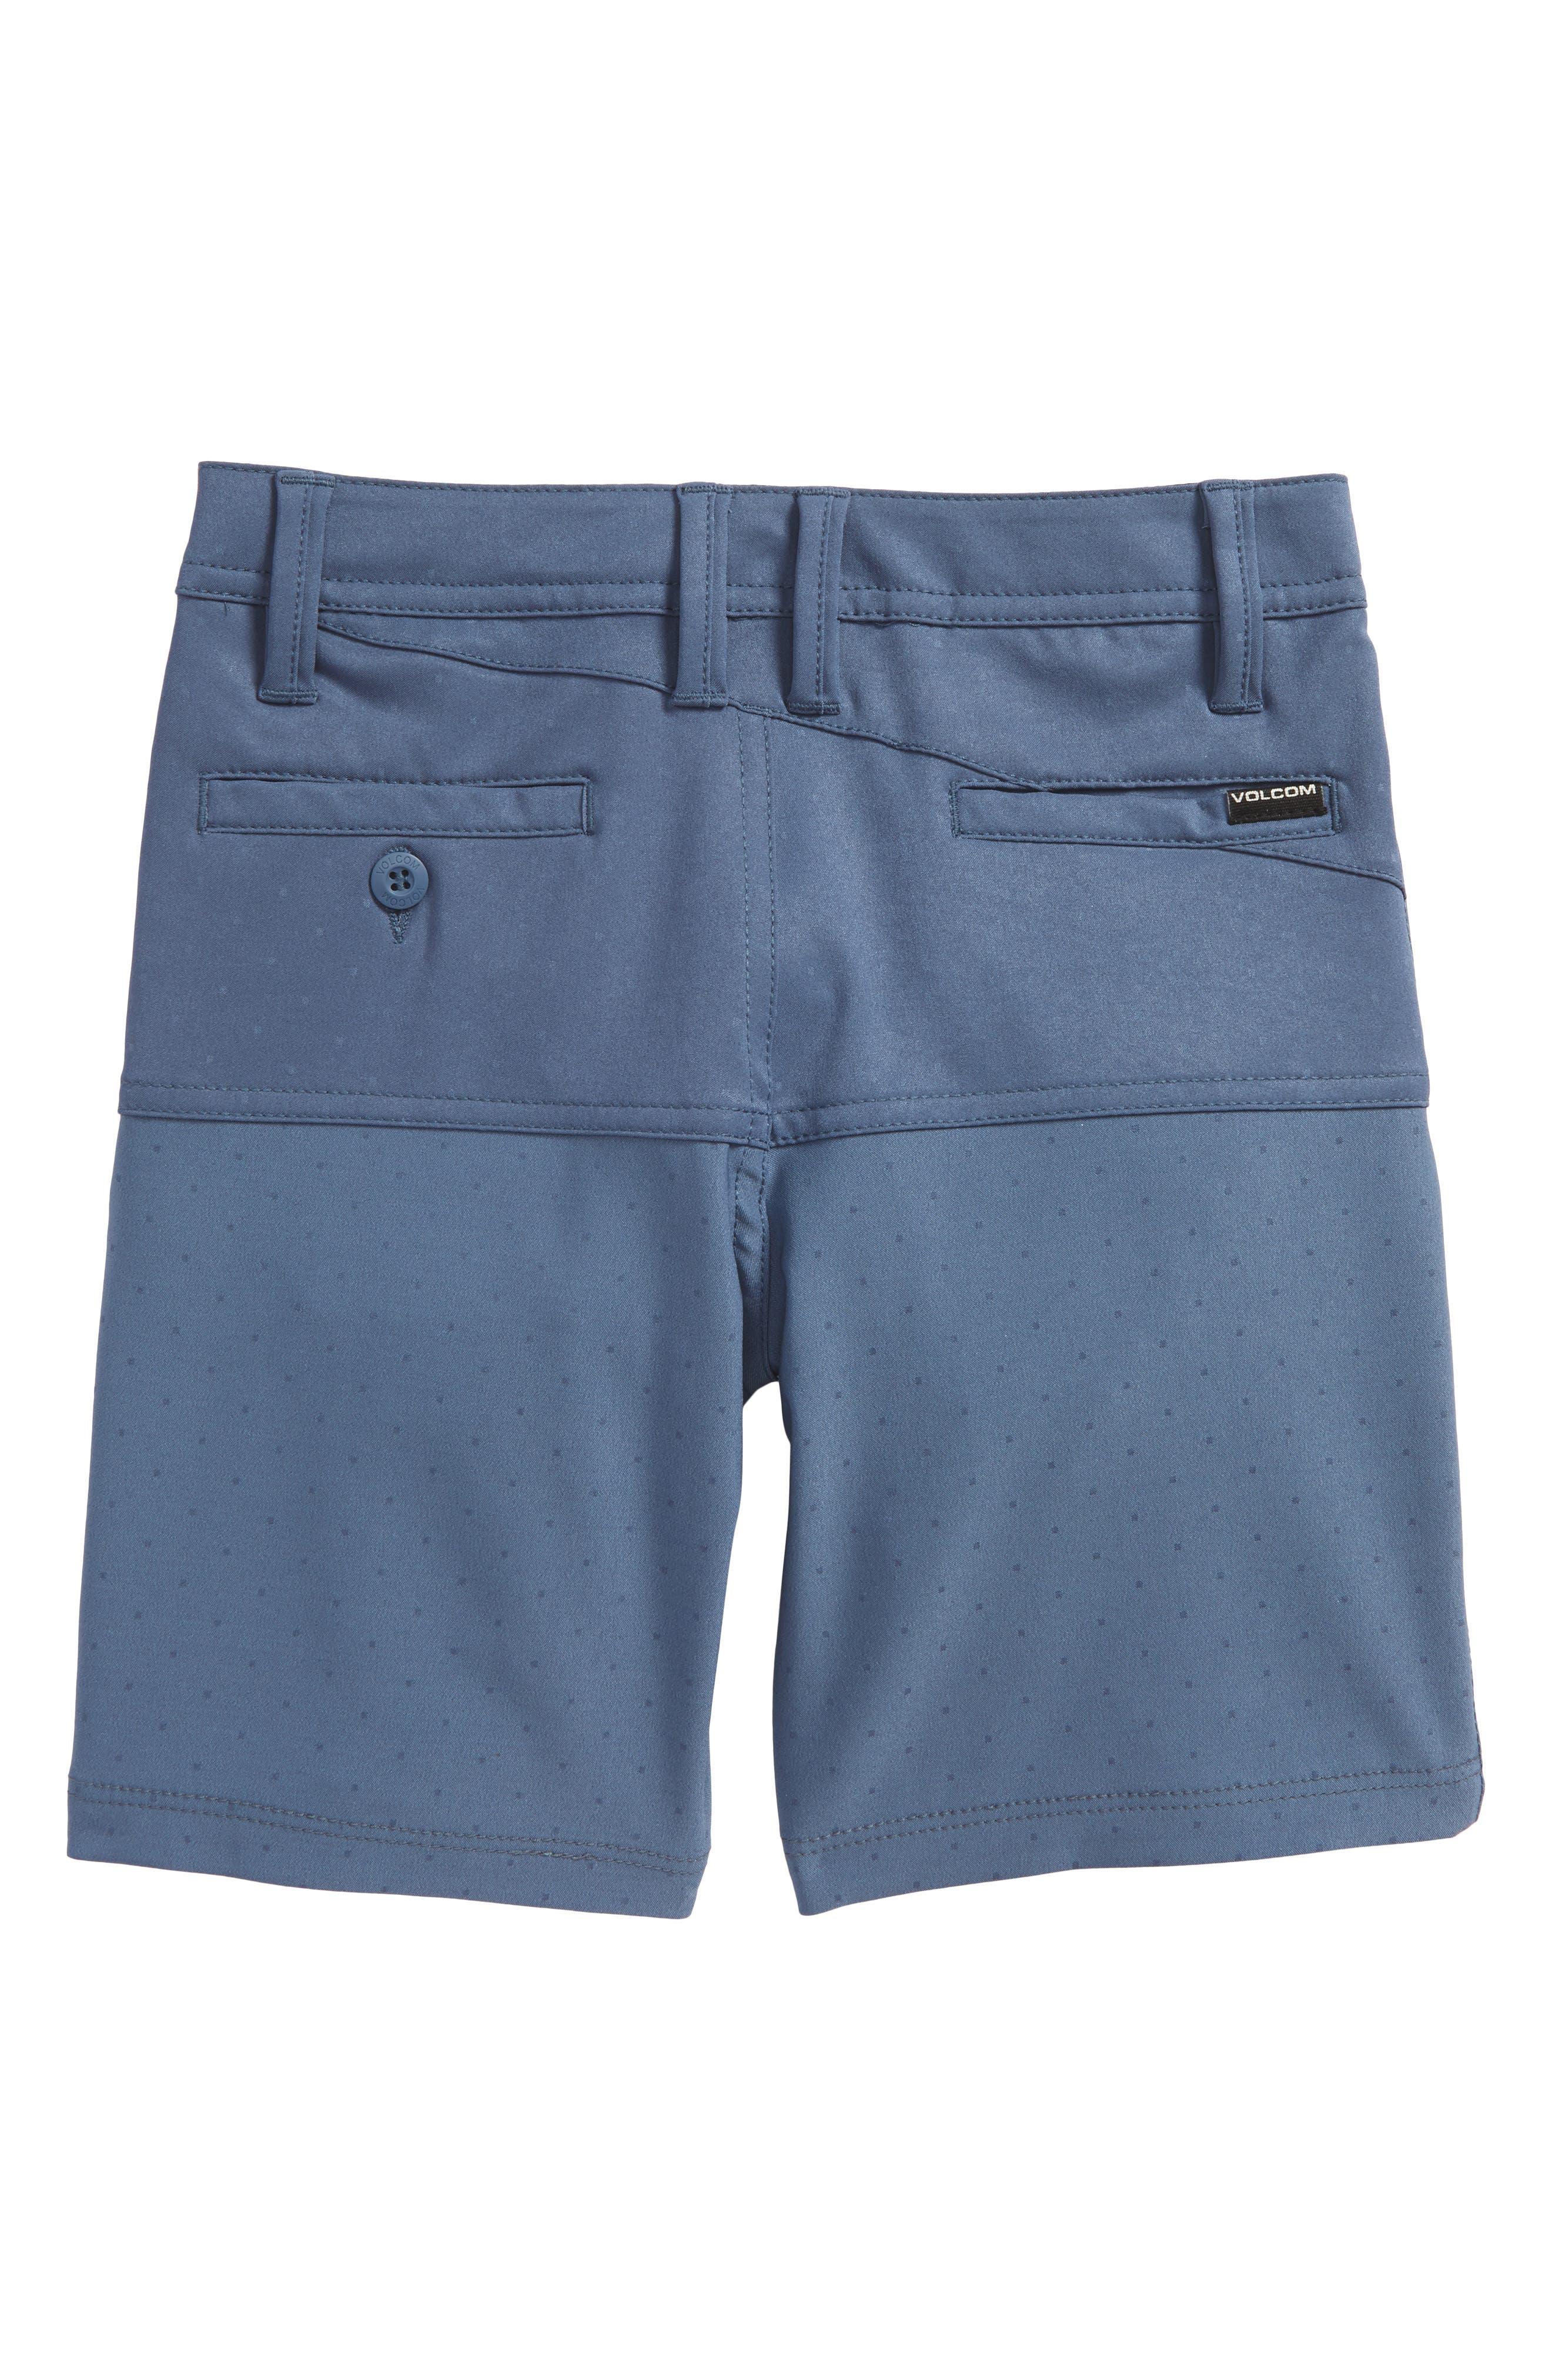 Surf N' Turf Hybrid Shorts,                             Alternate thumbnail 2, color,                             Deep Blue